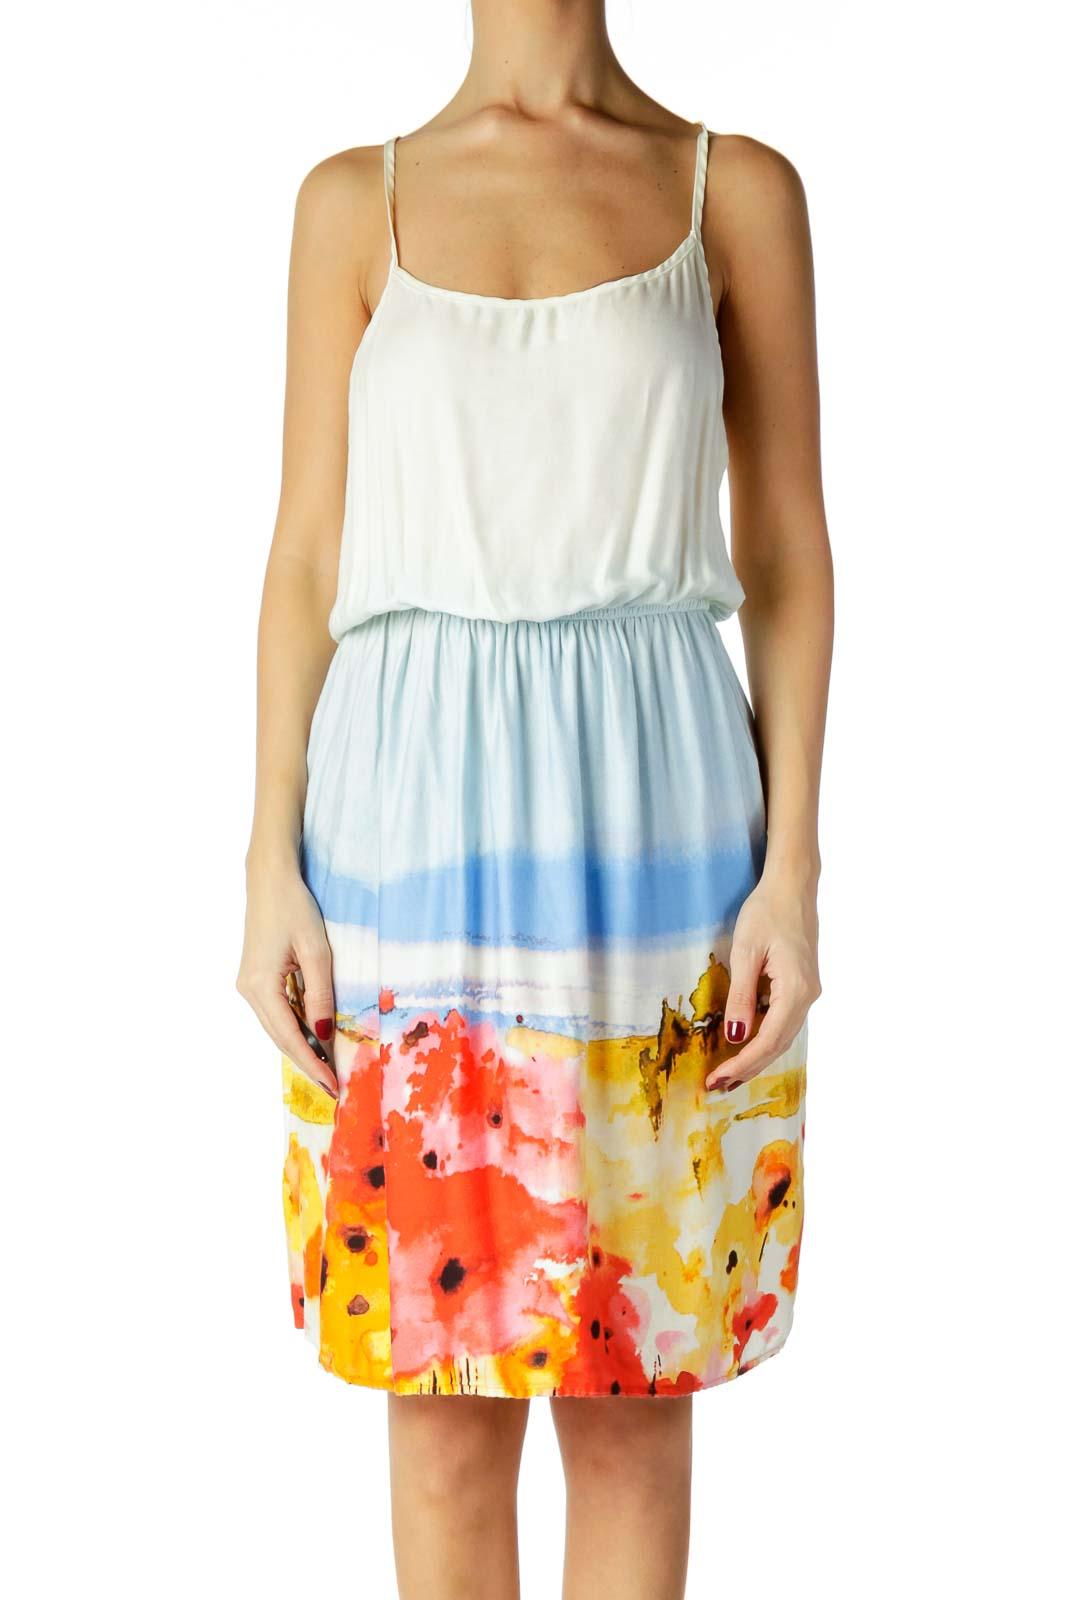 Blue White Tie Dye Jersey Dress